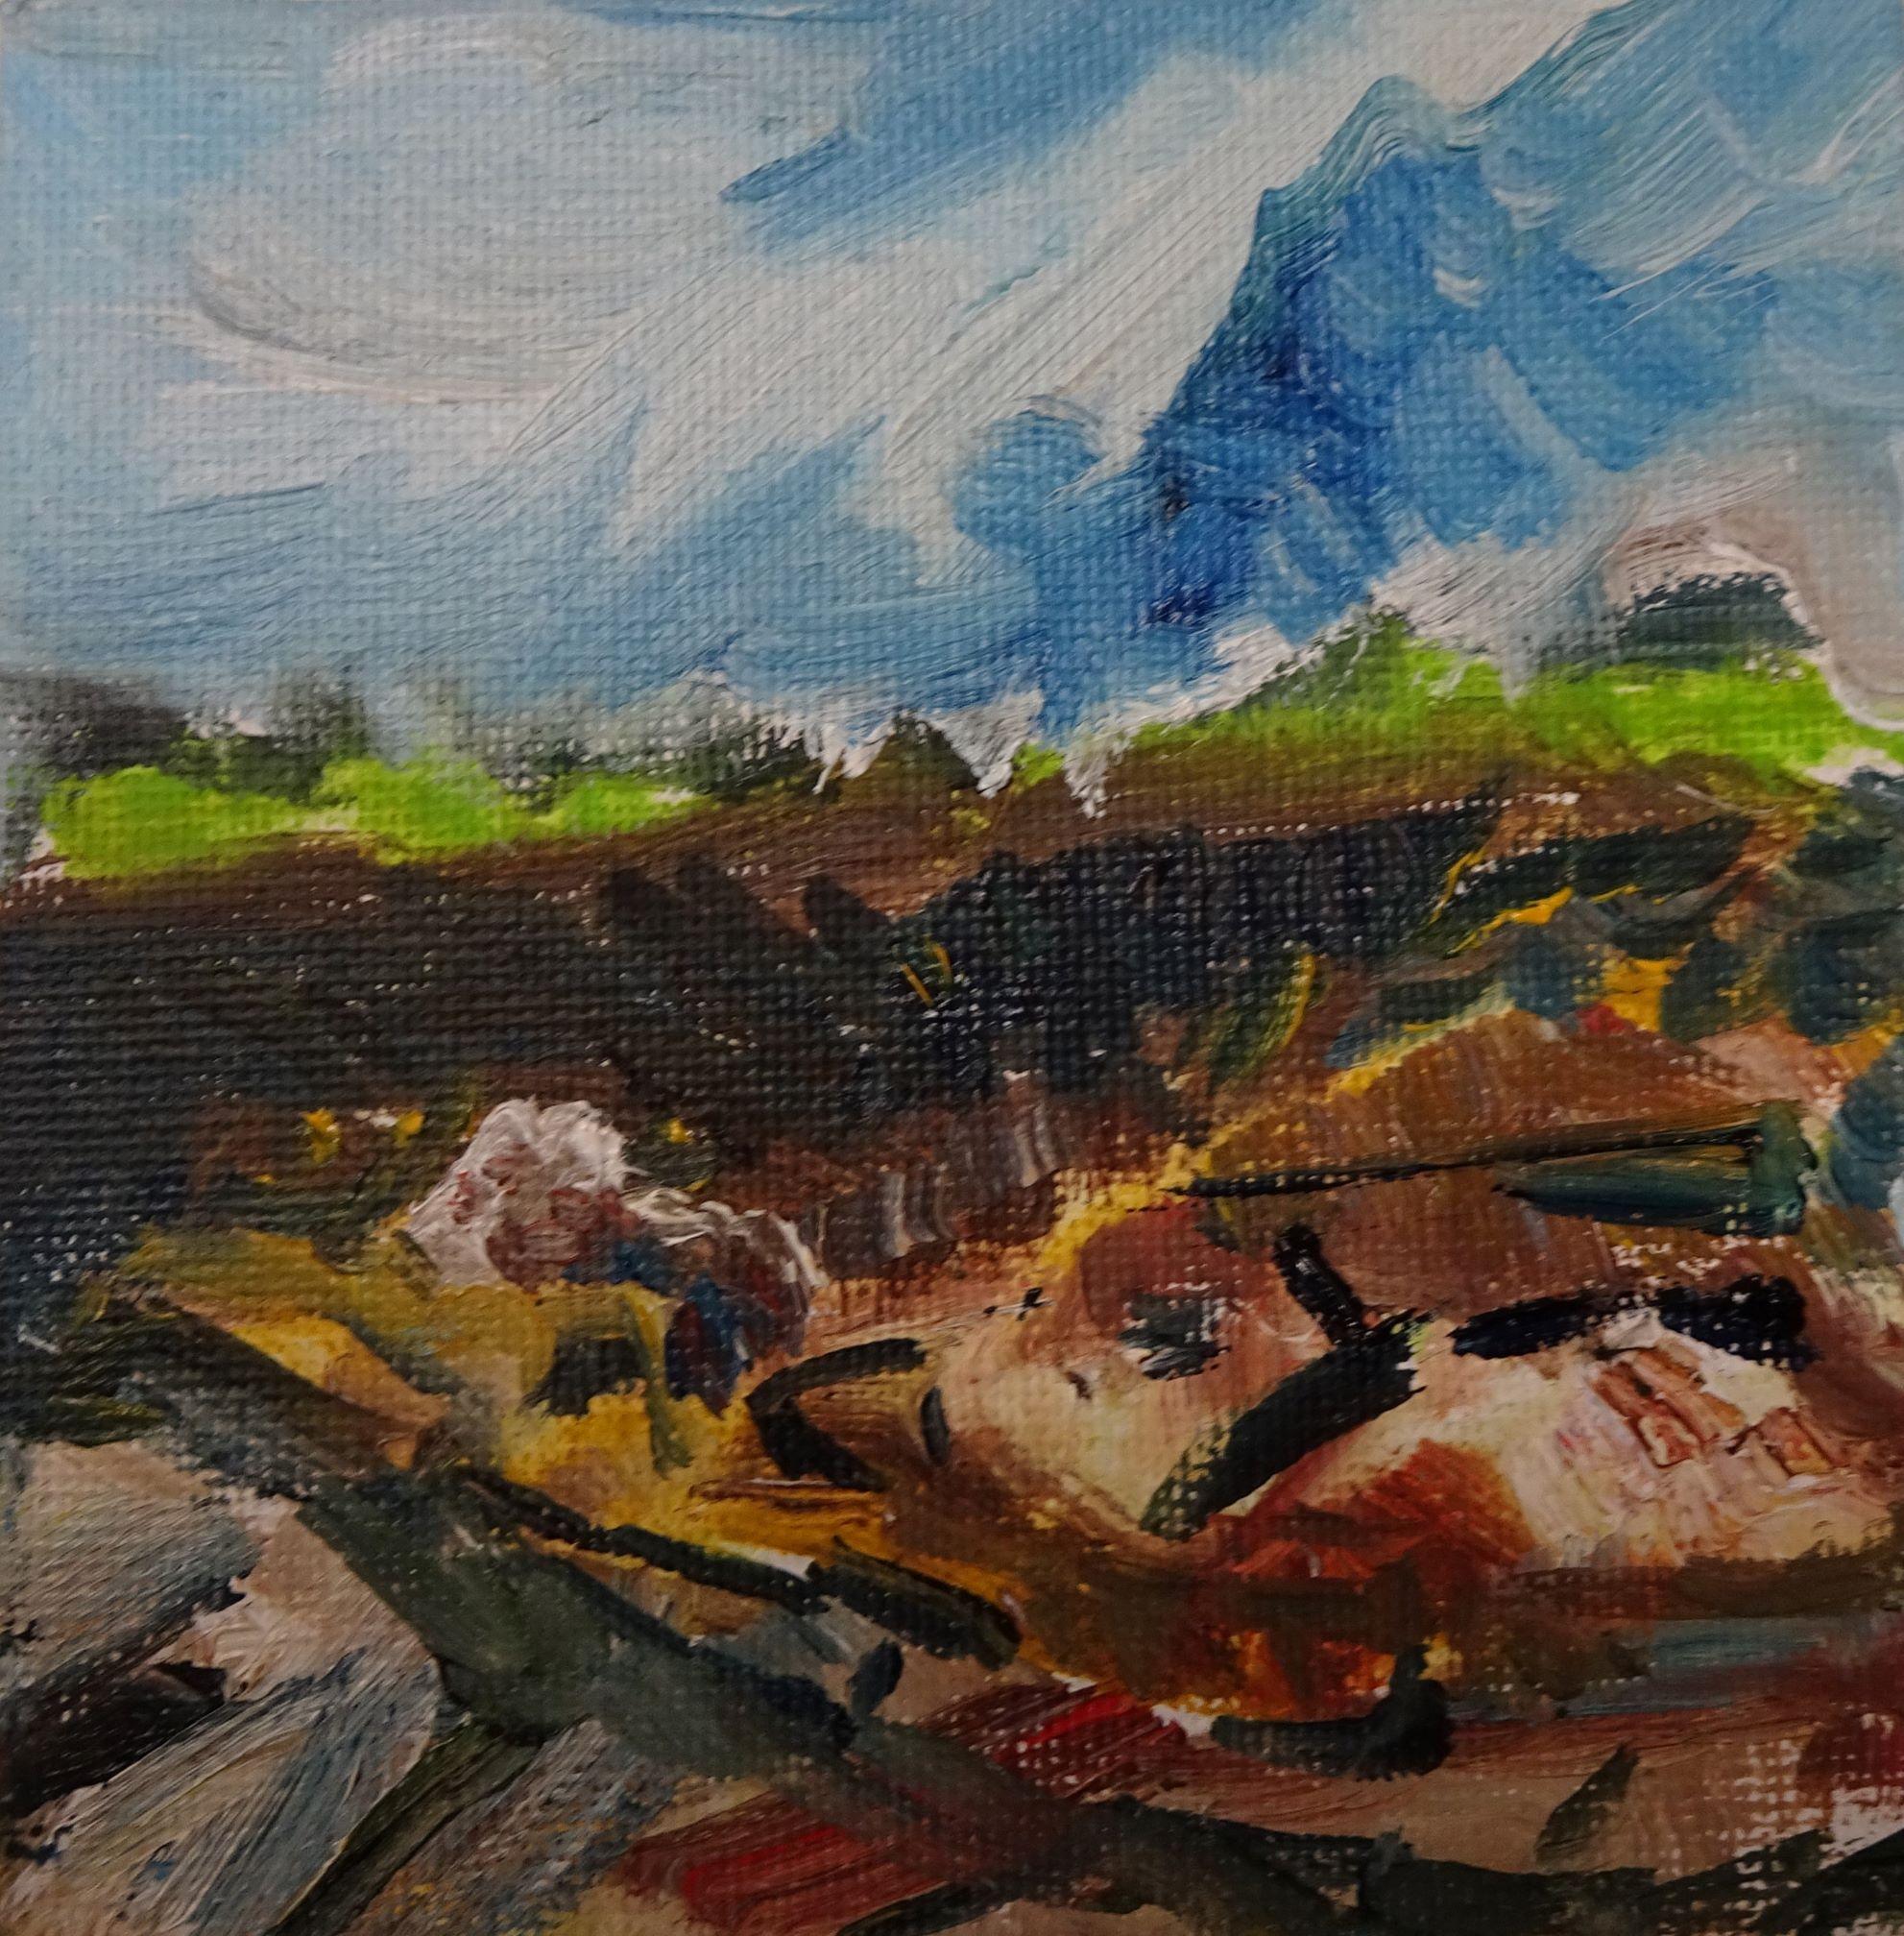 sm-painting-1-2021-07-05-07.43.05